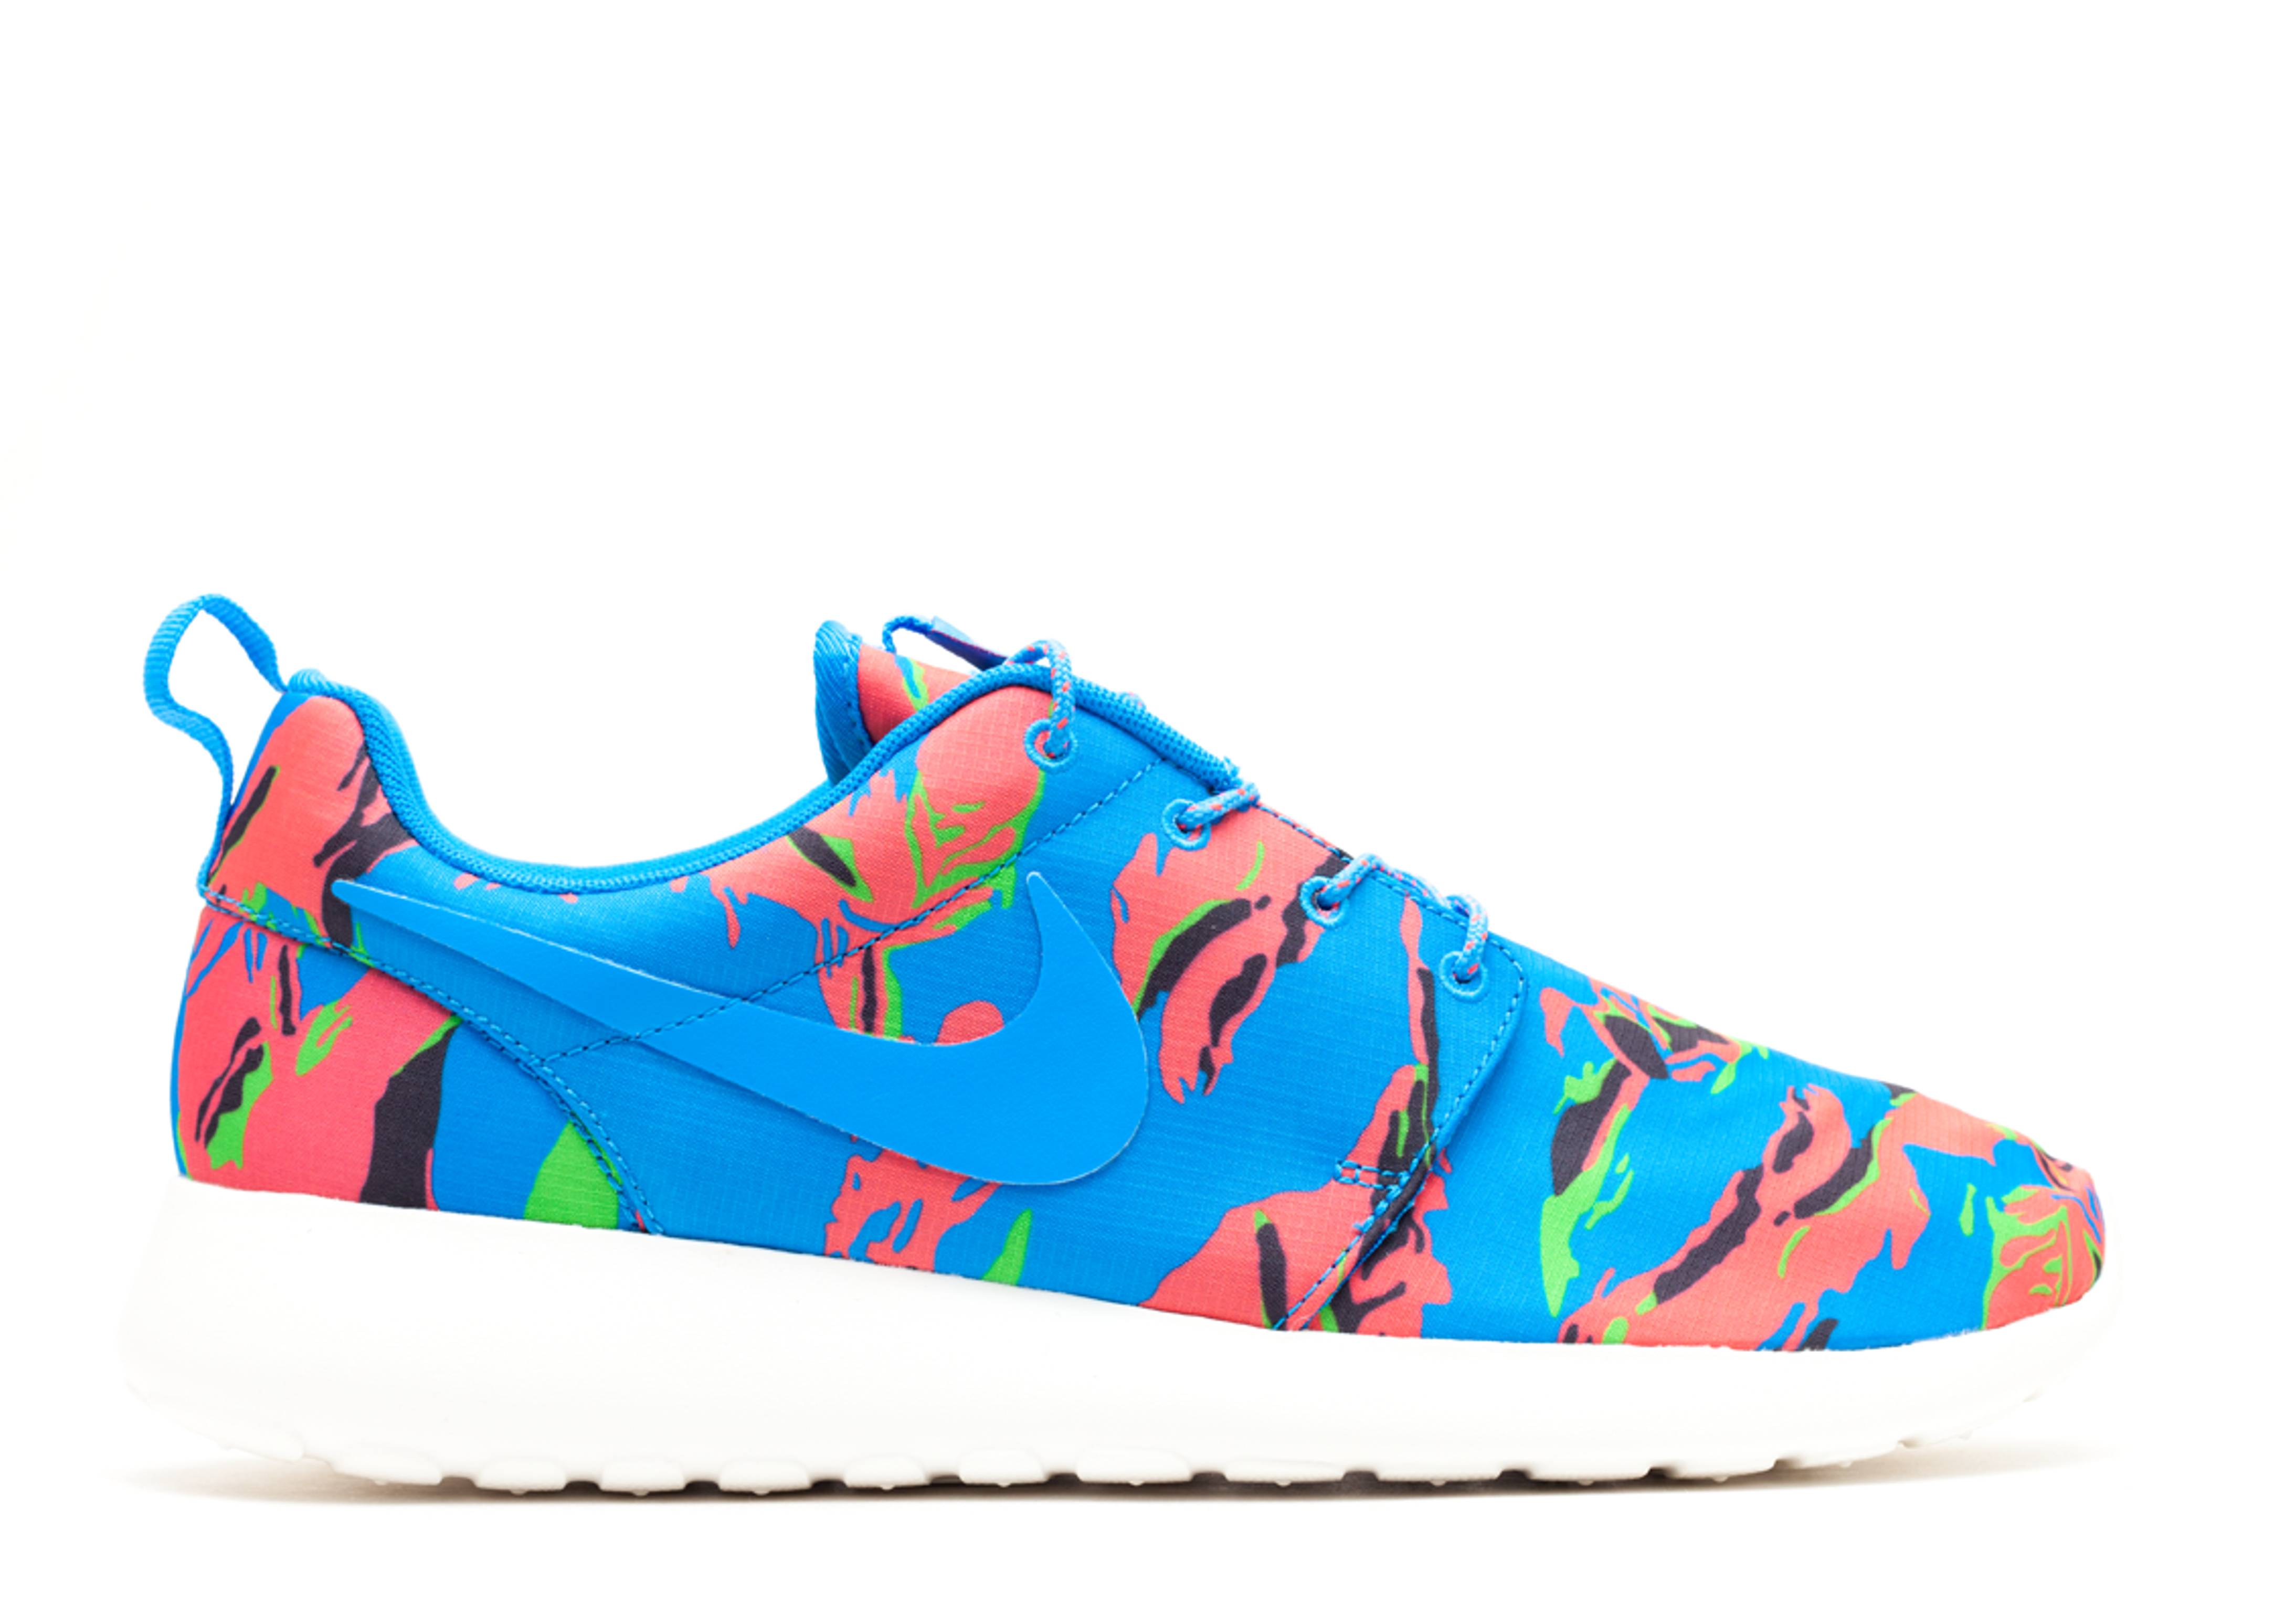 Nike roshe run gpx blue hero tiger camo